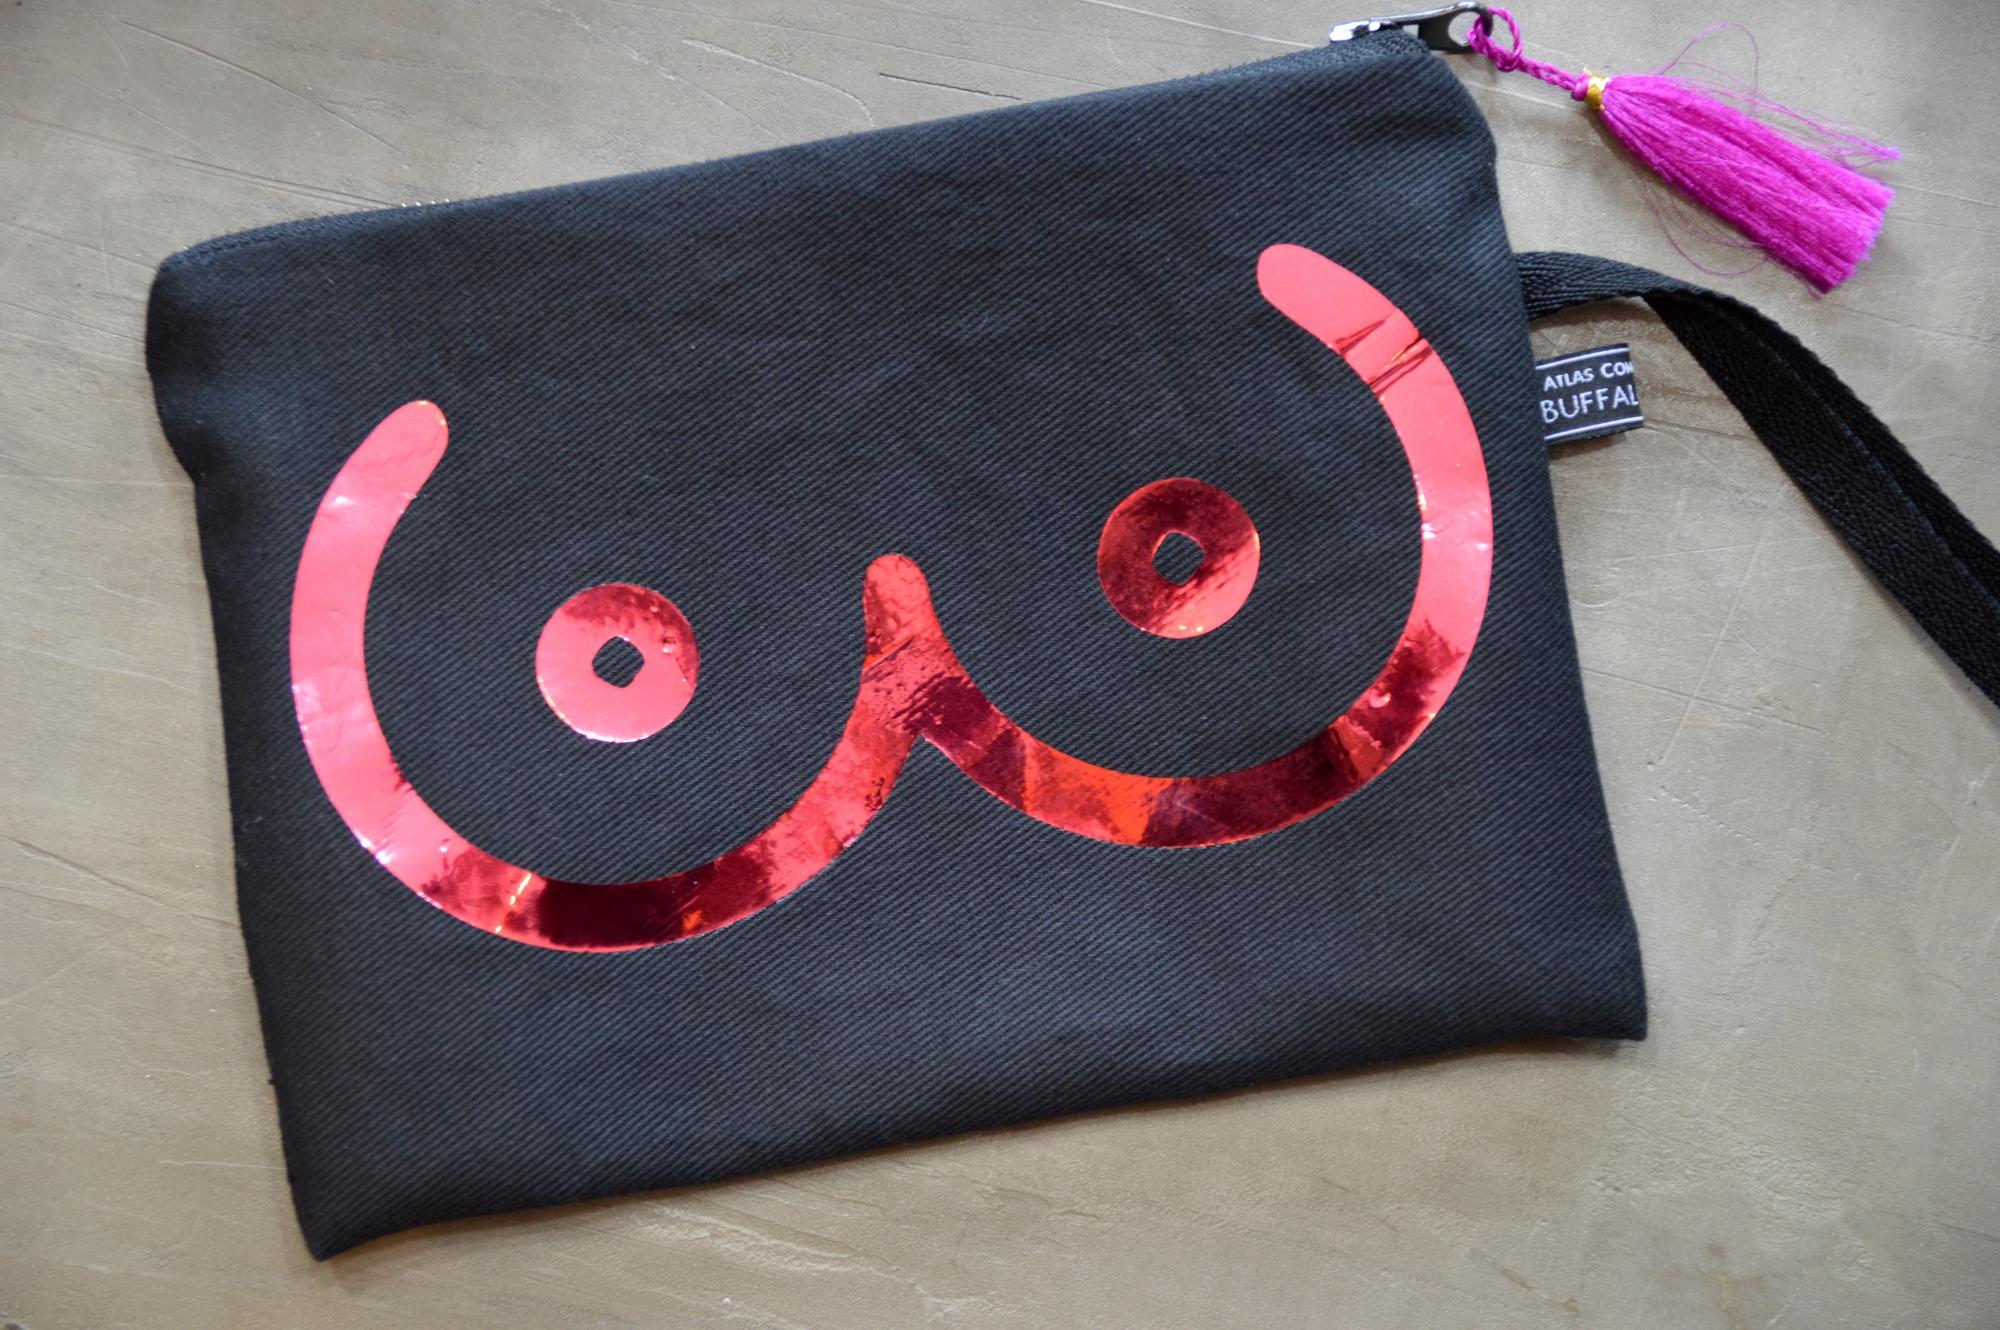 boobie clutch bag made in buffalo ny gift shop